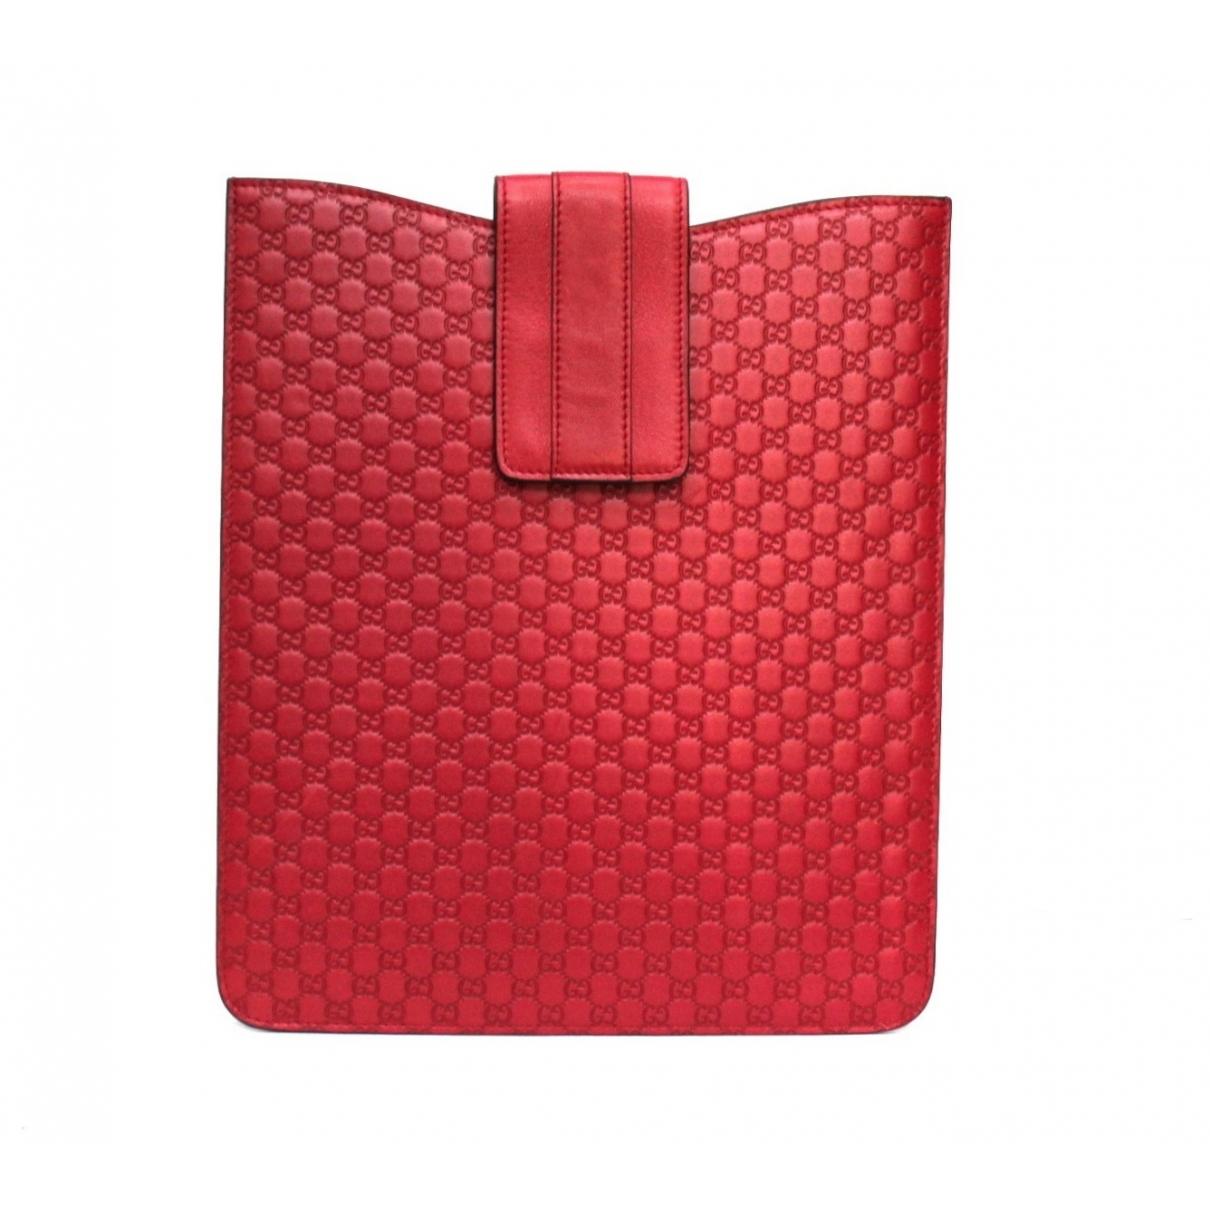 Gucci \N Accessoires in  Rot Leder